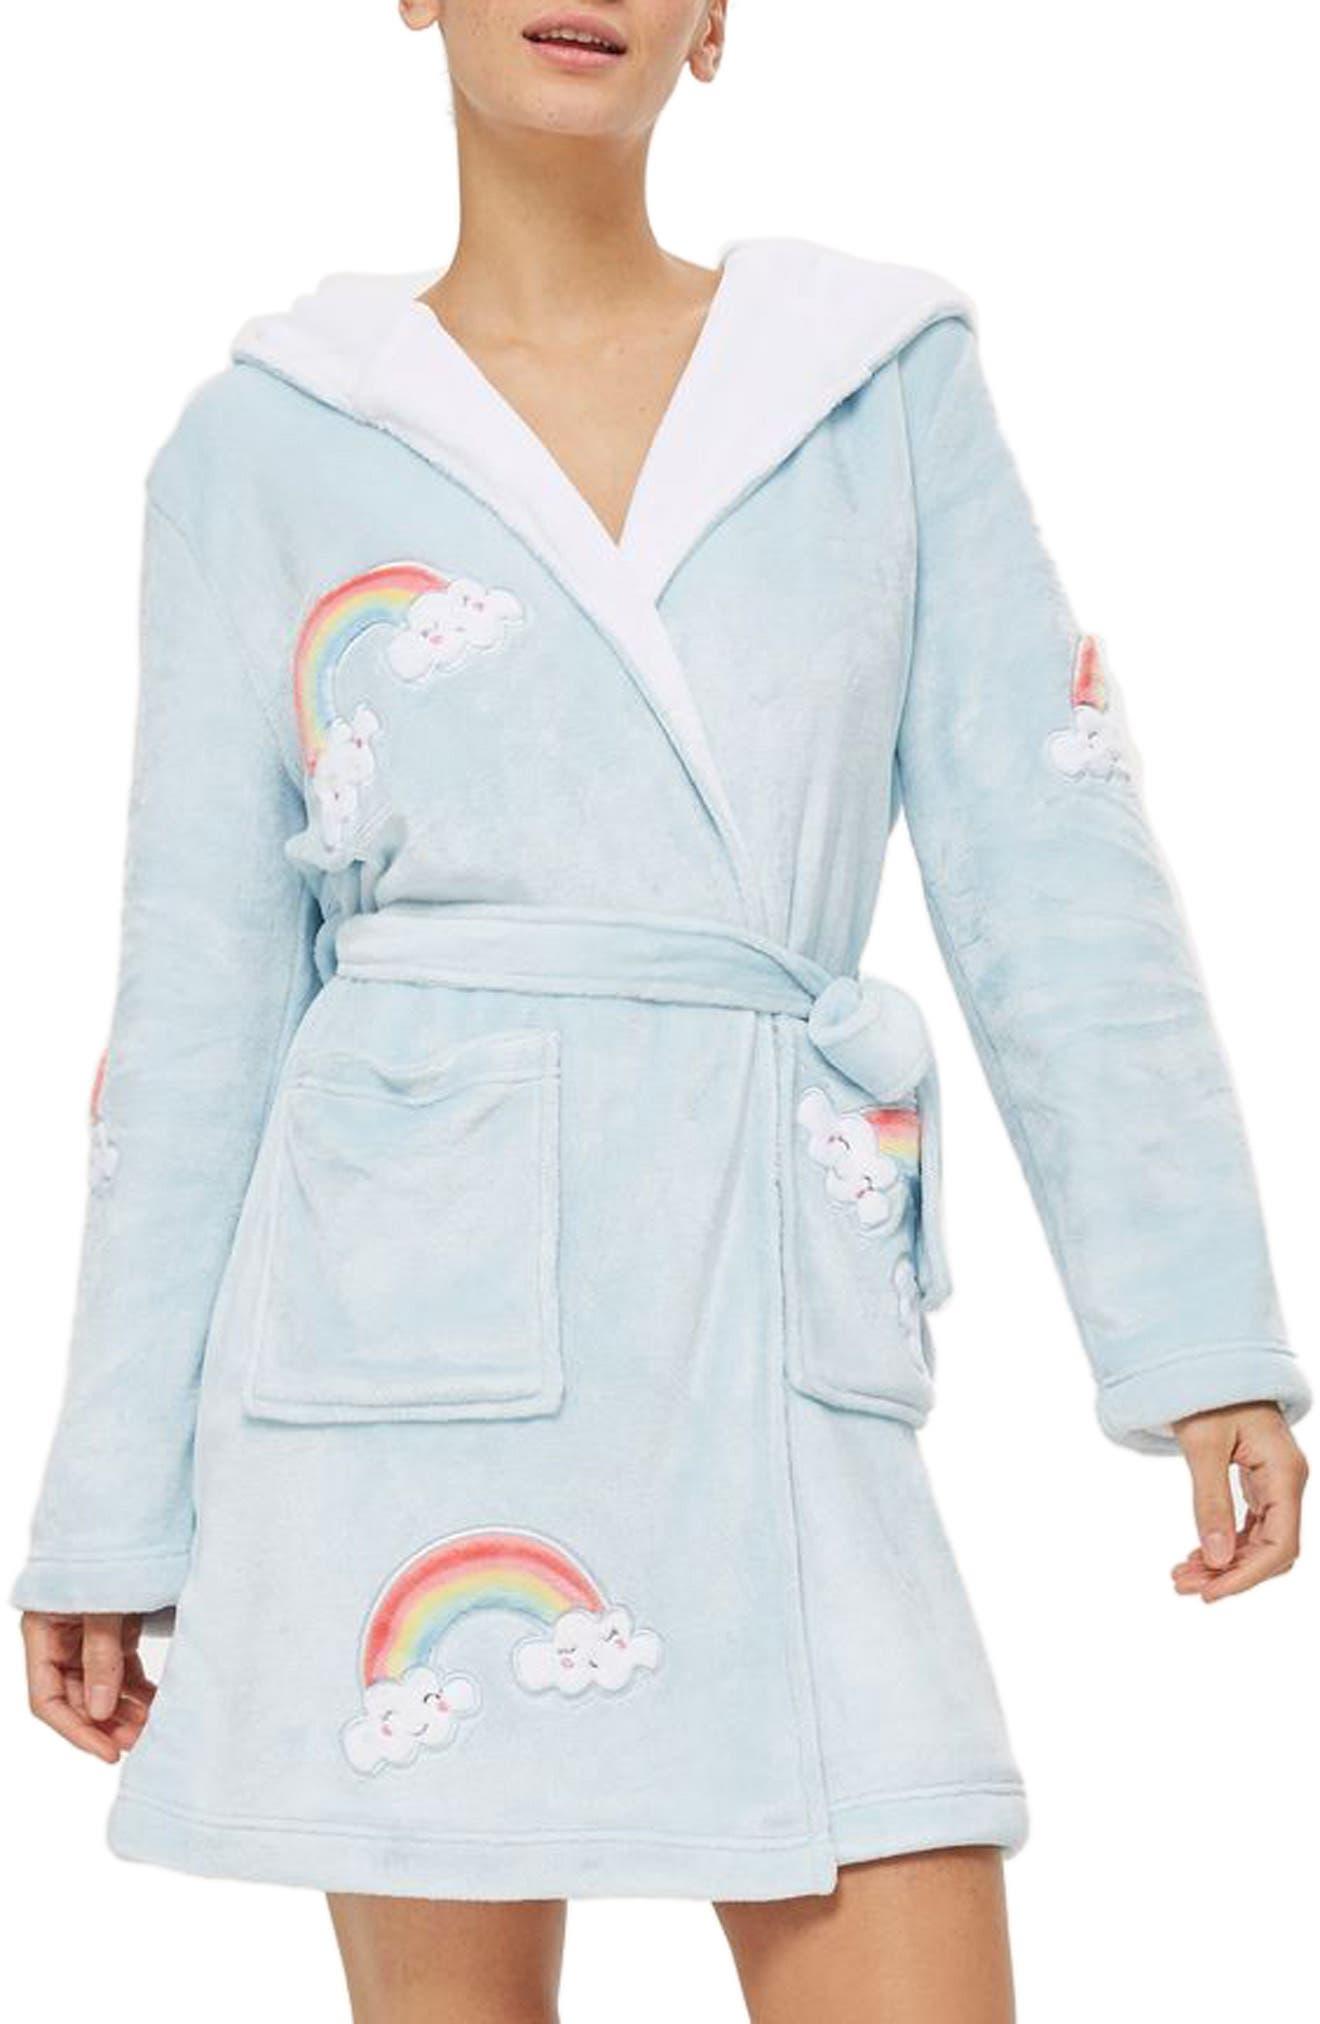 Rainbow Dressing Robe,                         Main,                         color, Light Blue